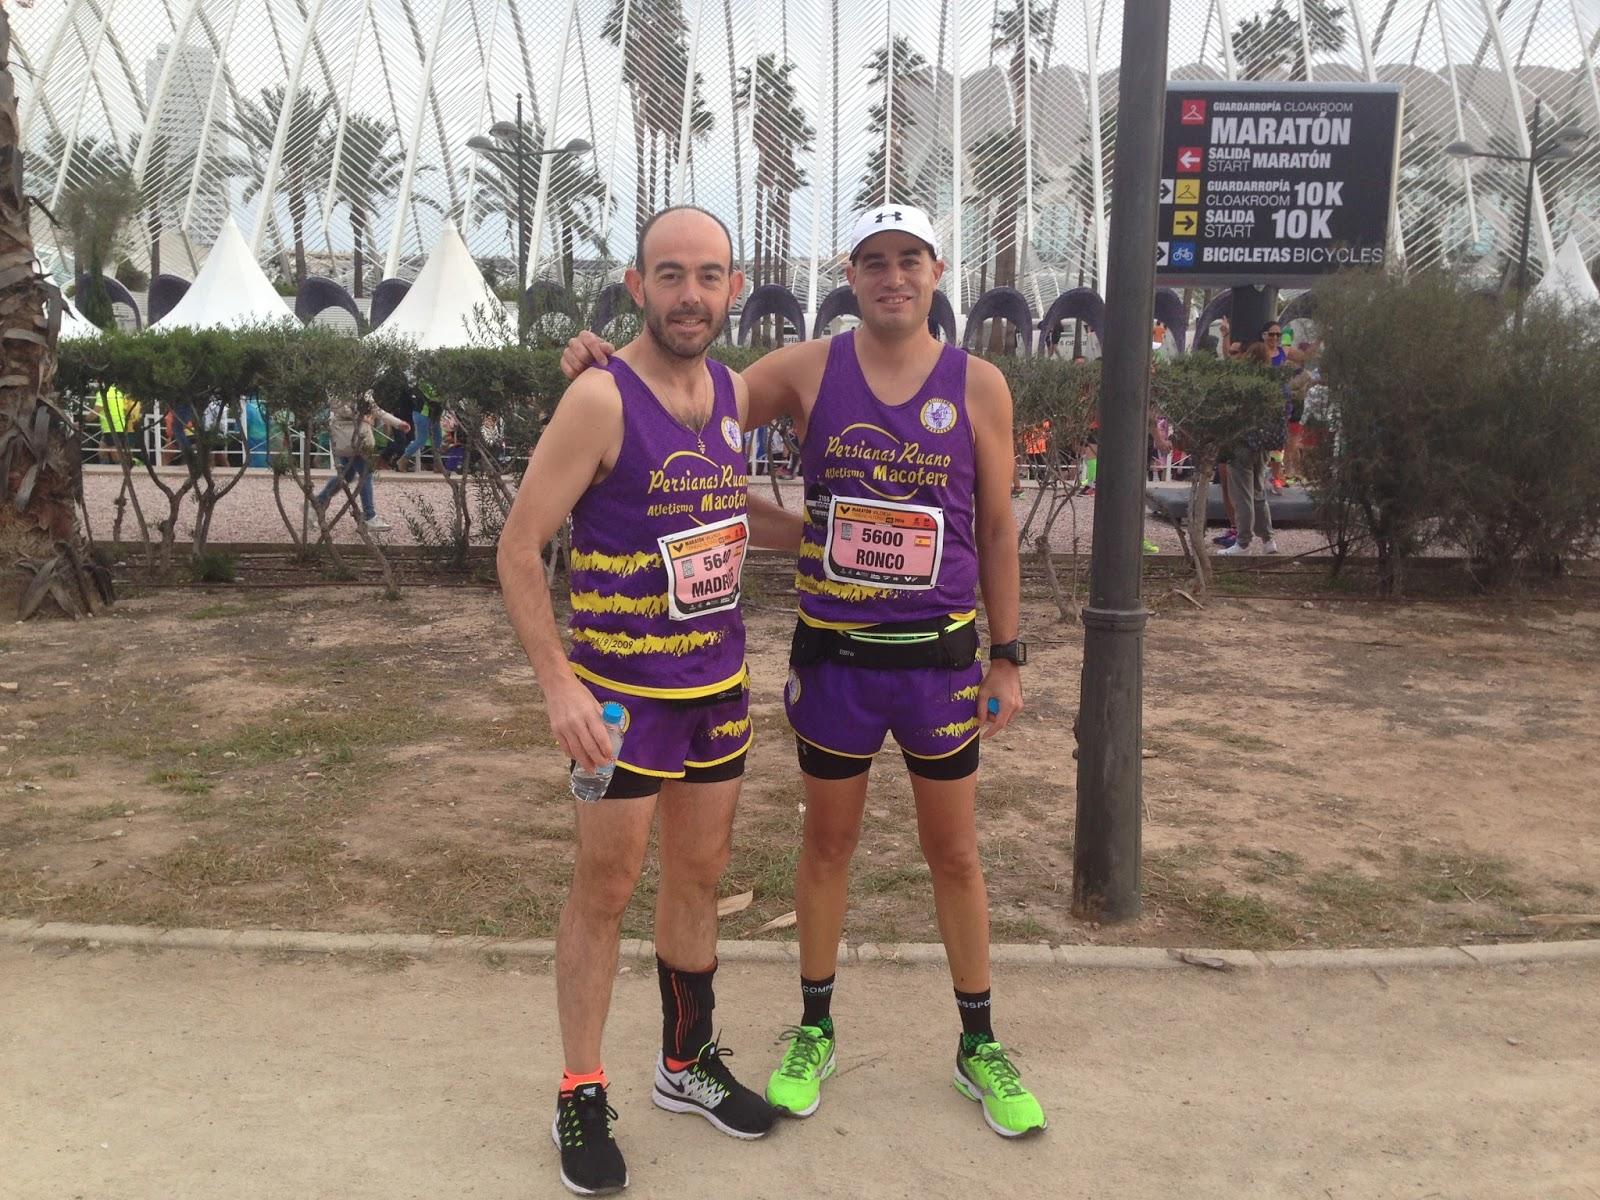 20 11 2016 maraton valencia ronco 2